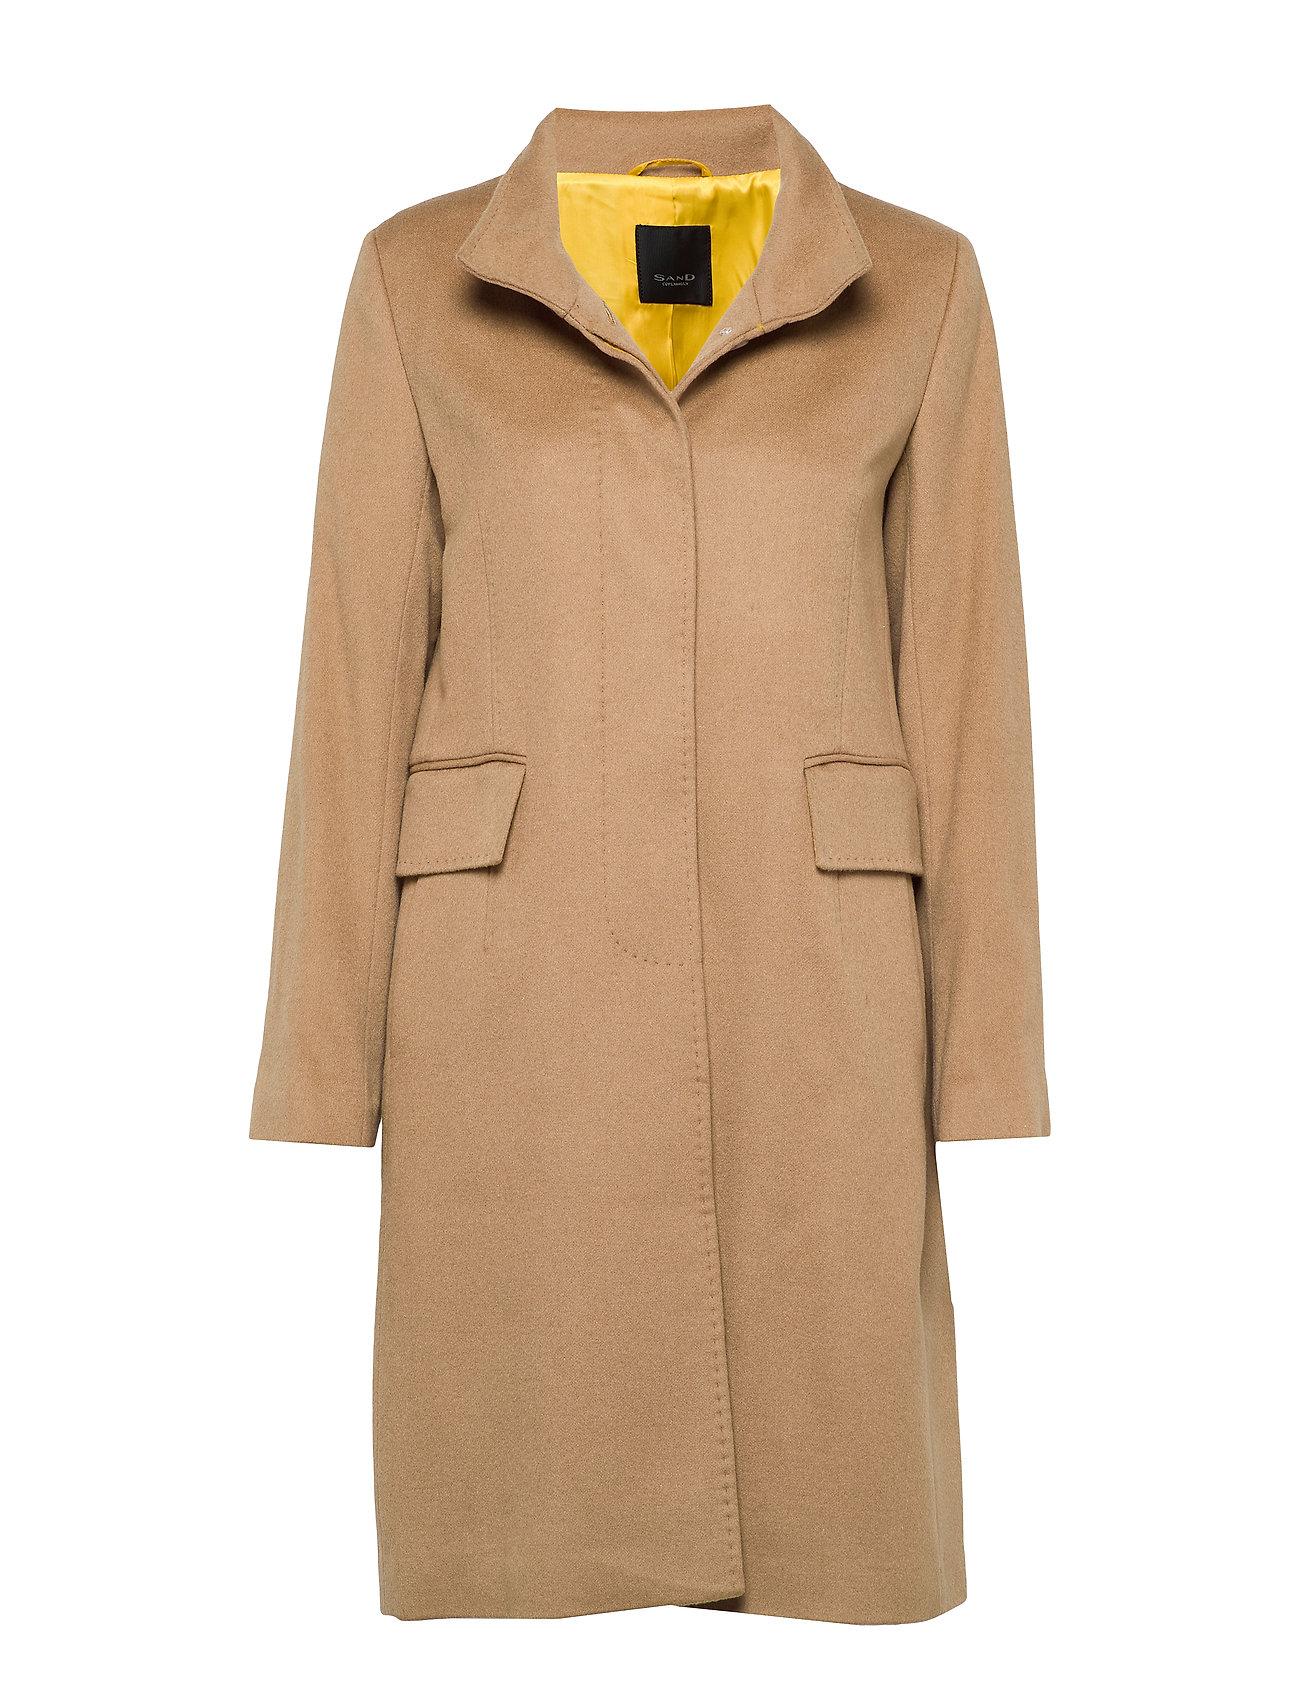 SAND Cashmere Coat WW - Parker 3 - LIGHT CAMEL